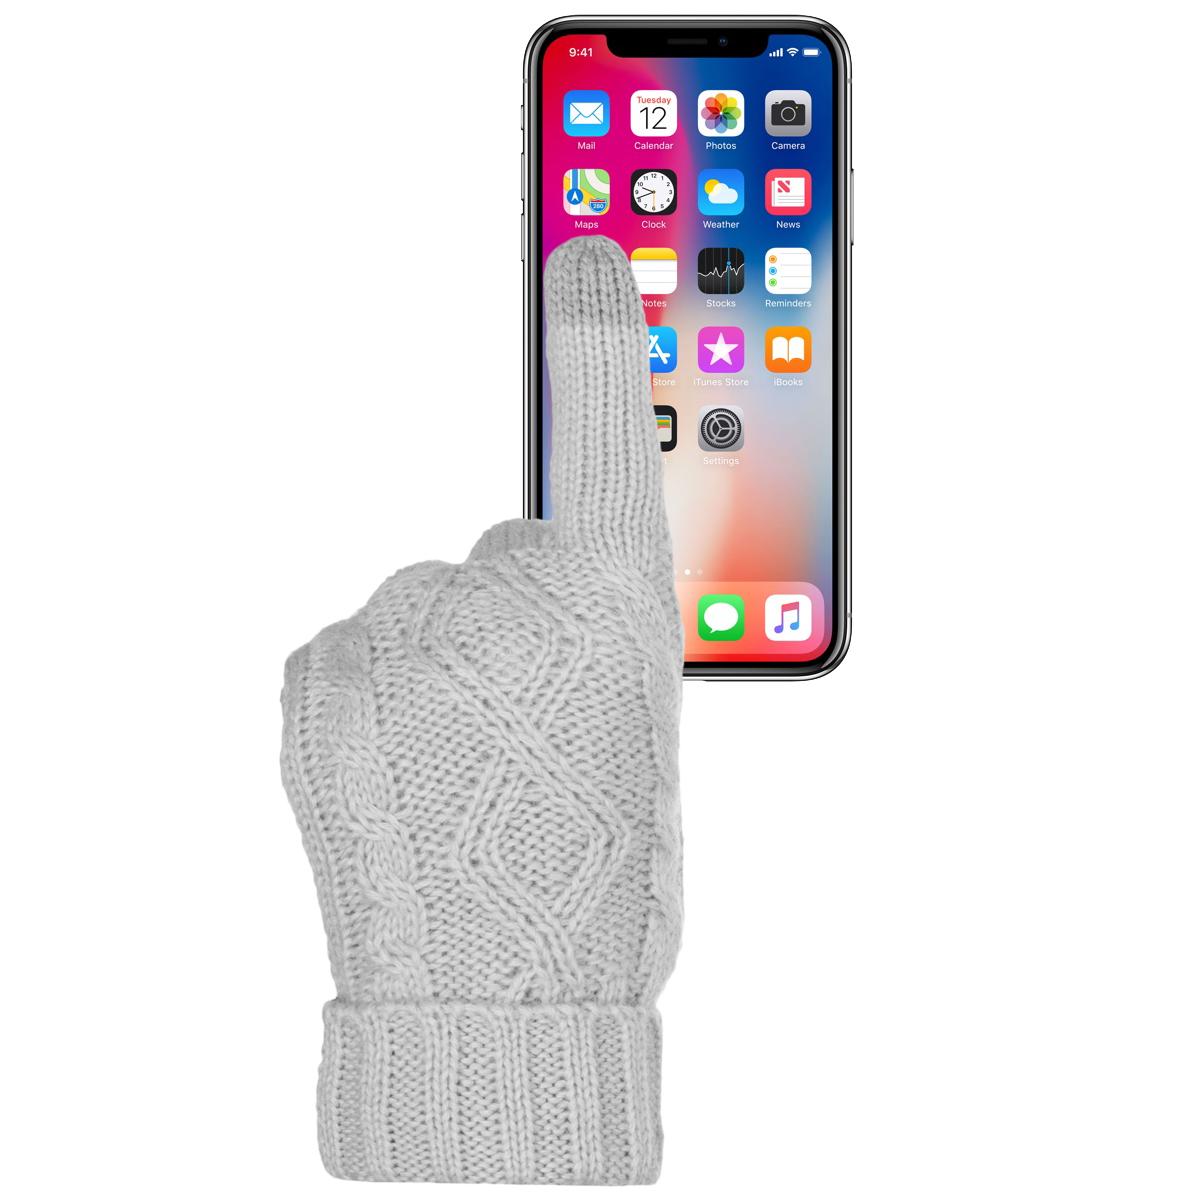 Warm-Cute-Texting-Gloves-Touch-Screen-Gloves-Knit-Gloves-Winter-Gloves-For-Women Indexbild 15